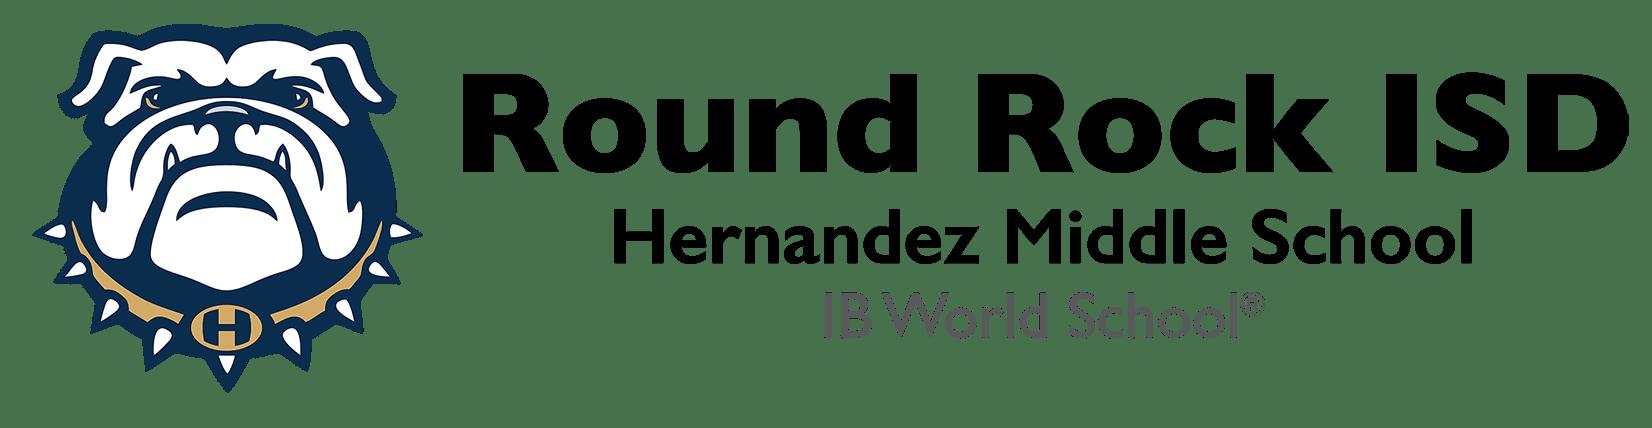 Hernandez Middle School